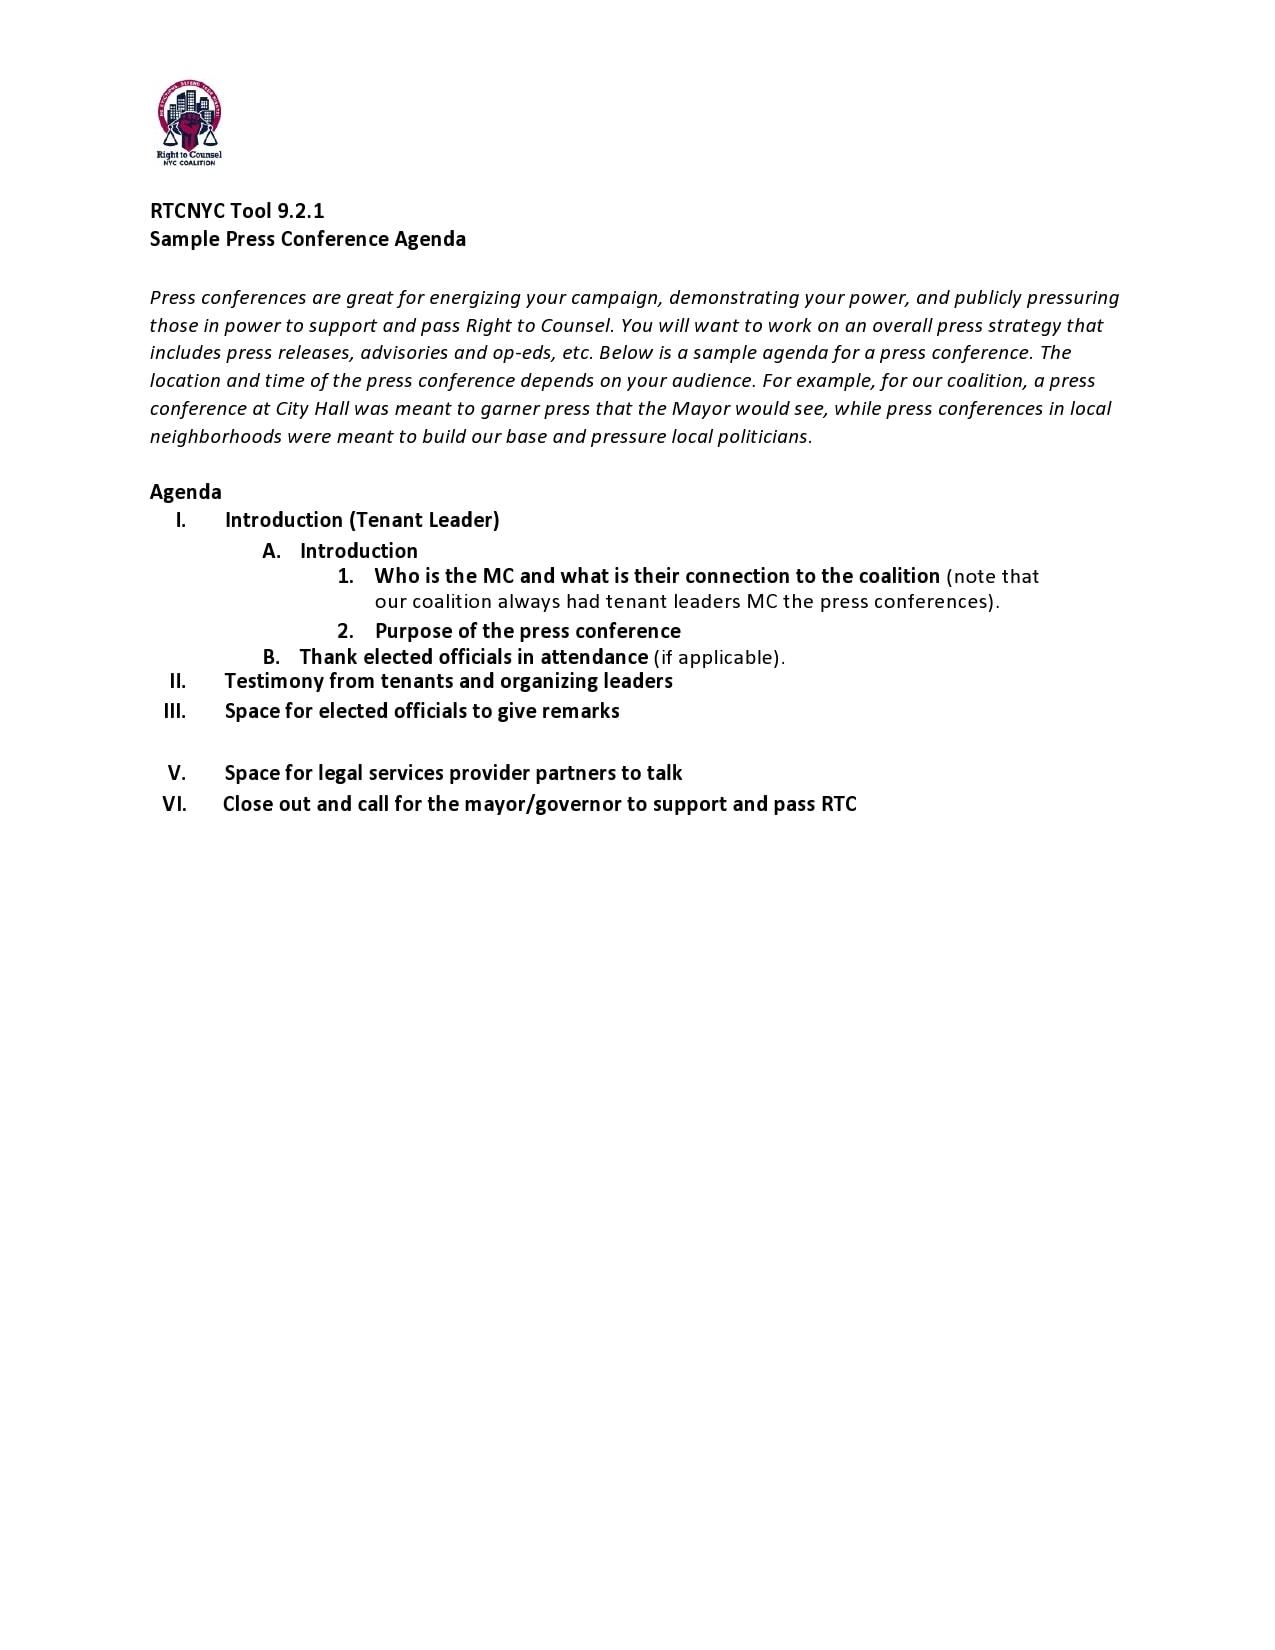 conference agenda template 13